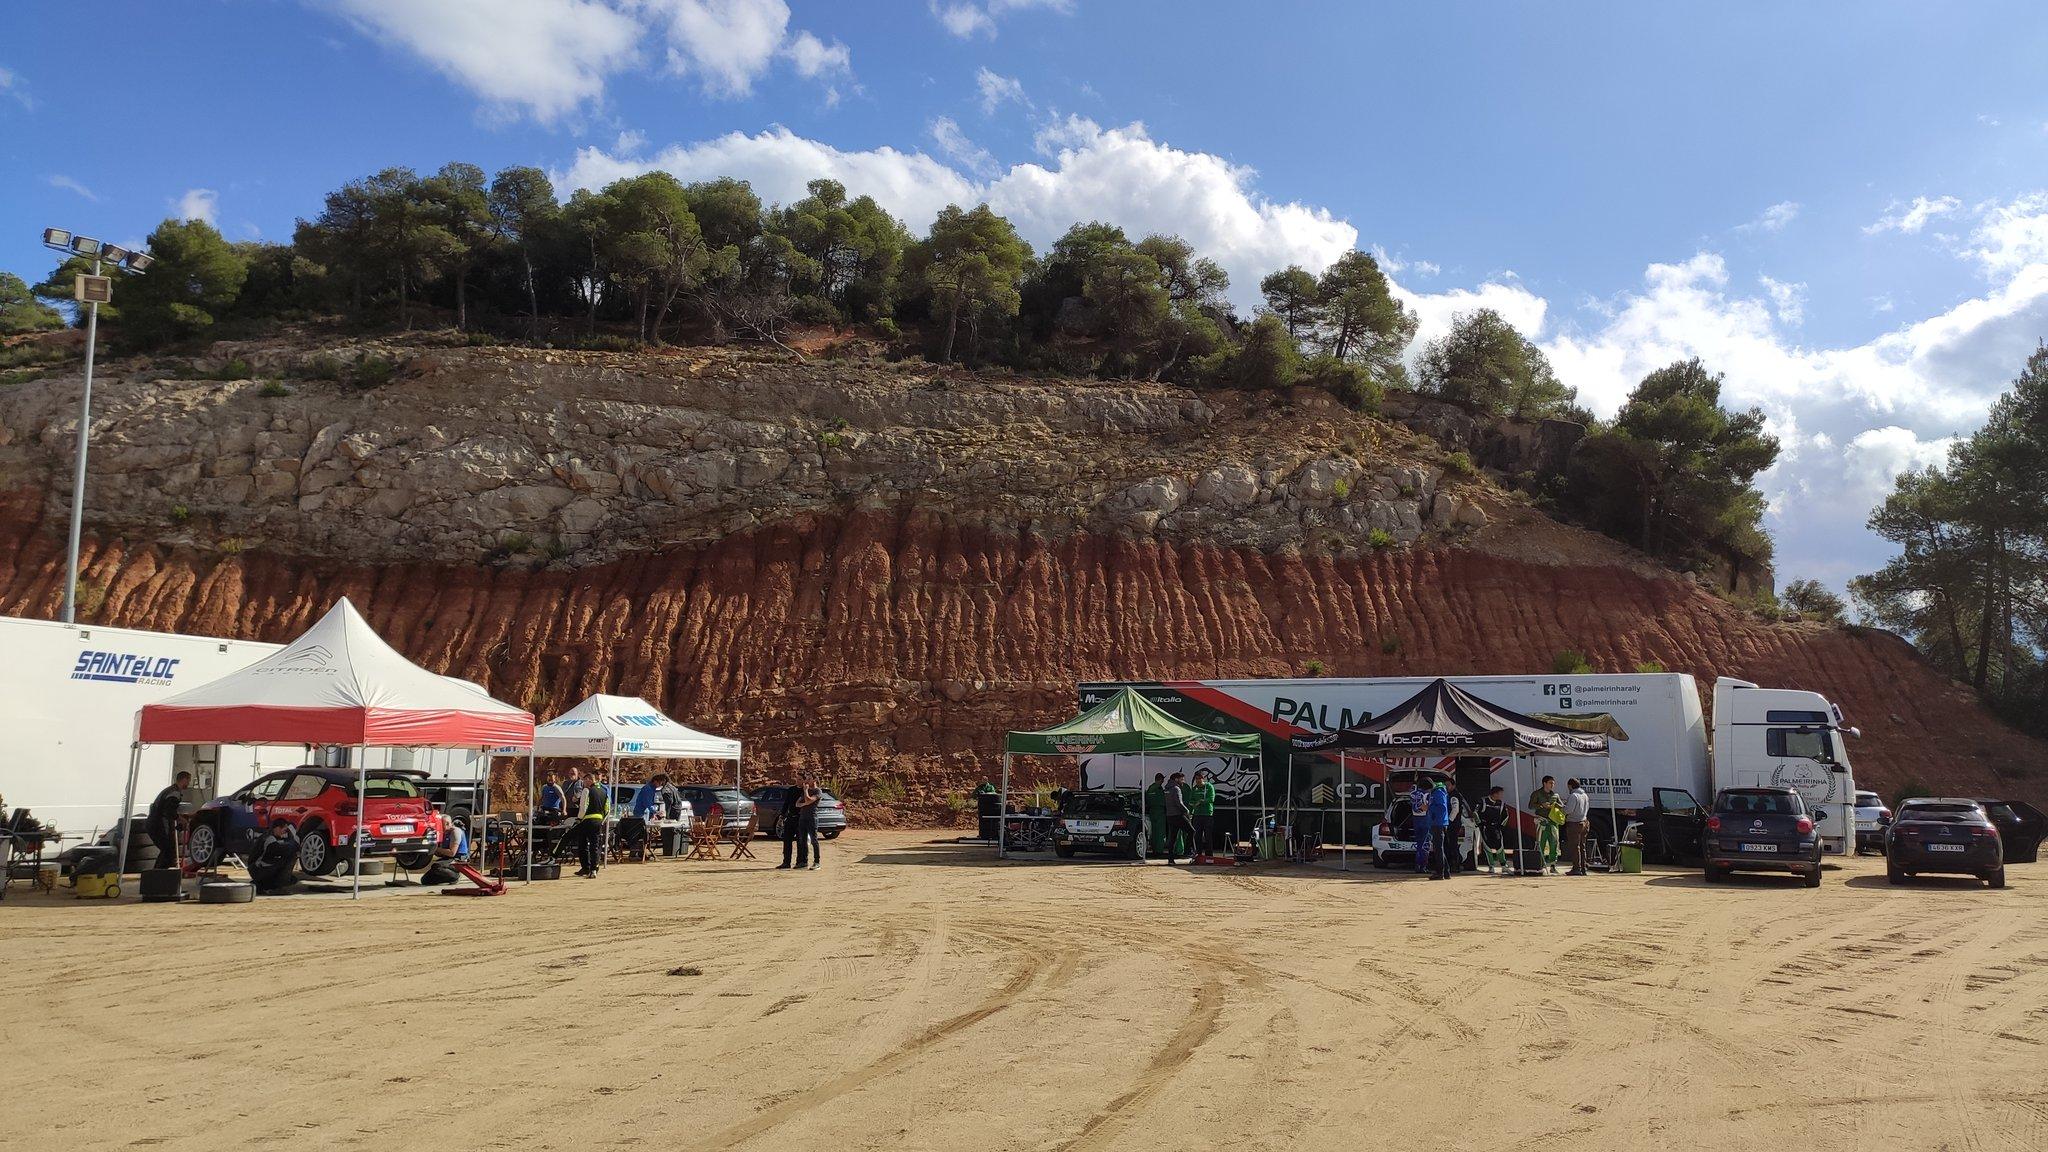 WRC: 55º RallyRACC Catalunya - Costa Daurada - Rally de España [24-27 Octubre] - Página 2 EHZvcE6WwAEvlQT?format=jpg&name=4096x4096